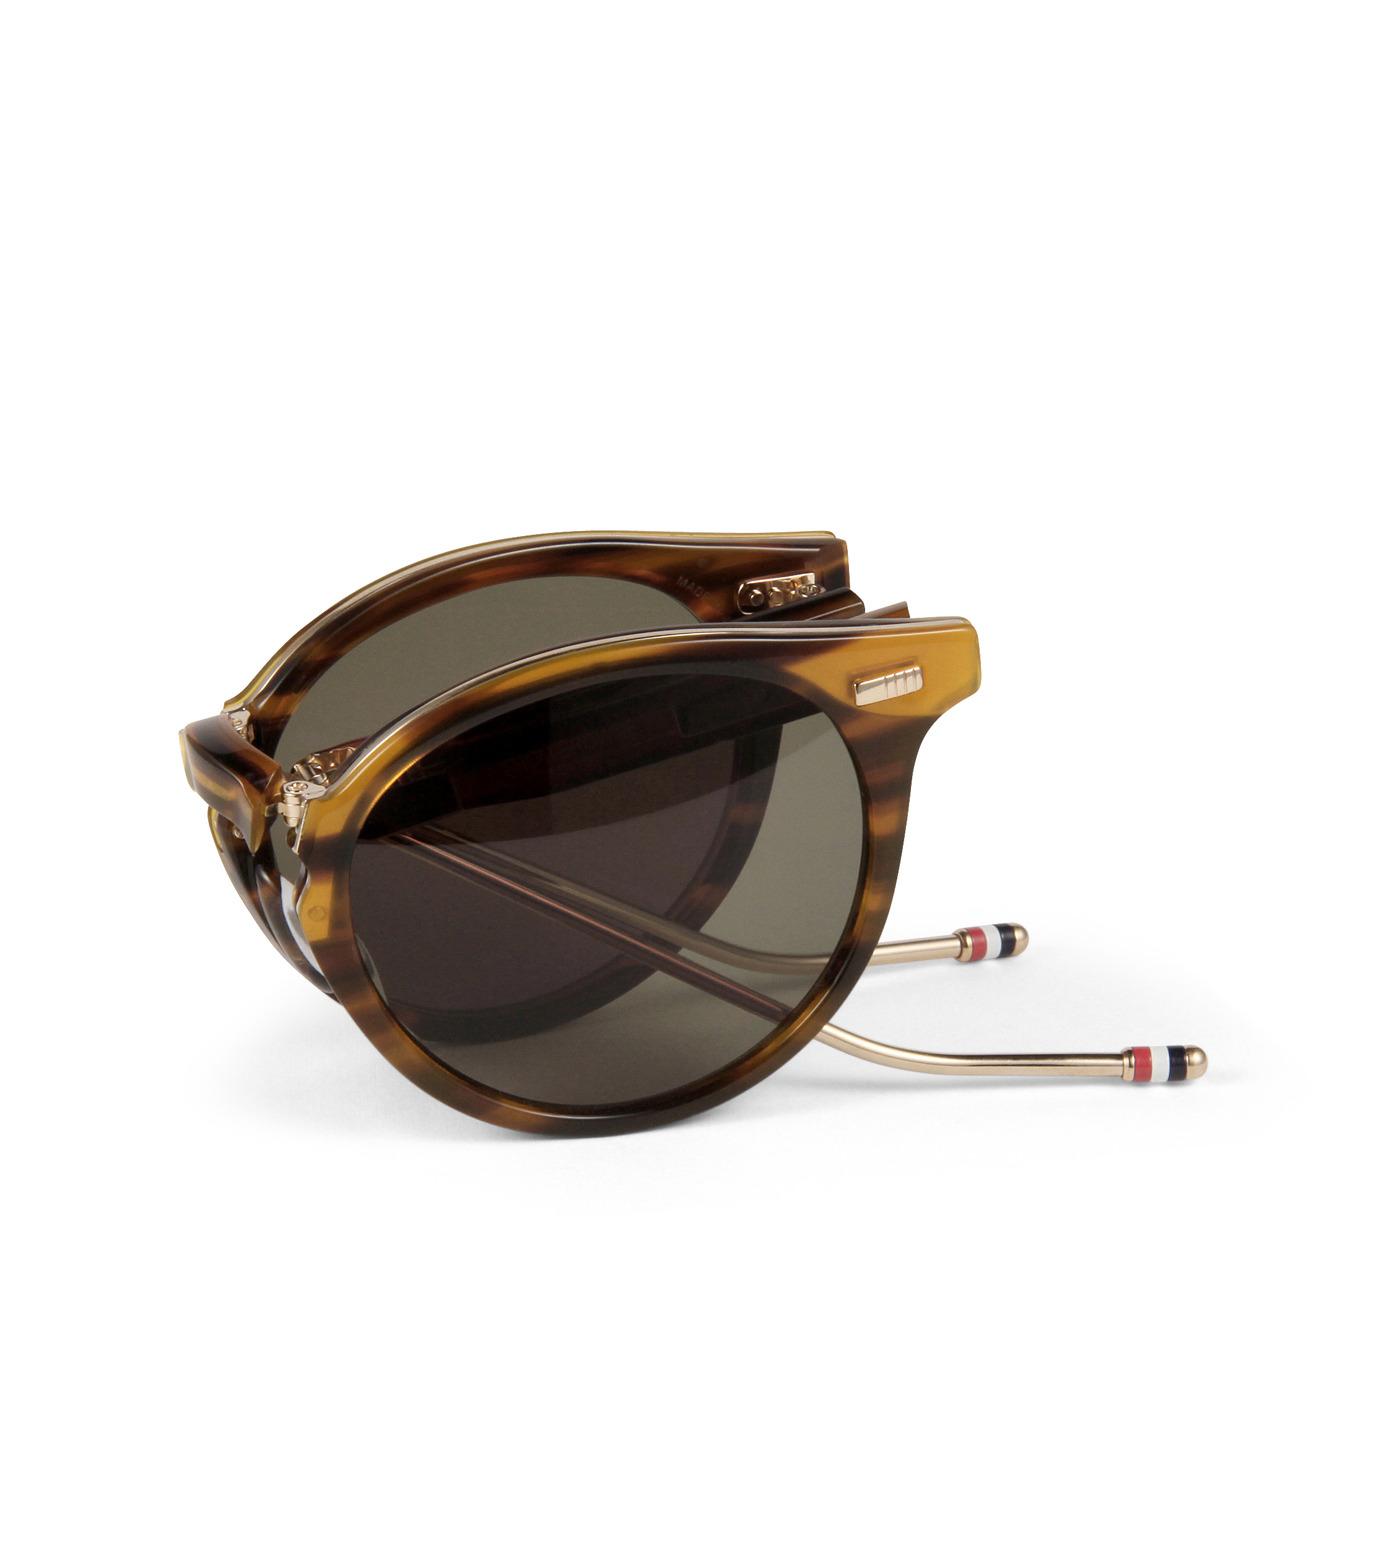 Thom Browne Eye Wear(トム・ブラウン・アイウェア)のFolding Roundframe-YELLOW(アイウェア/eyewear)-TB-806-B-32 拡大詳細画像4